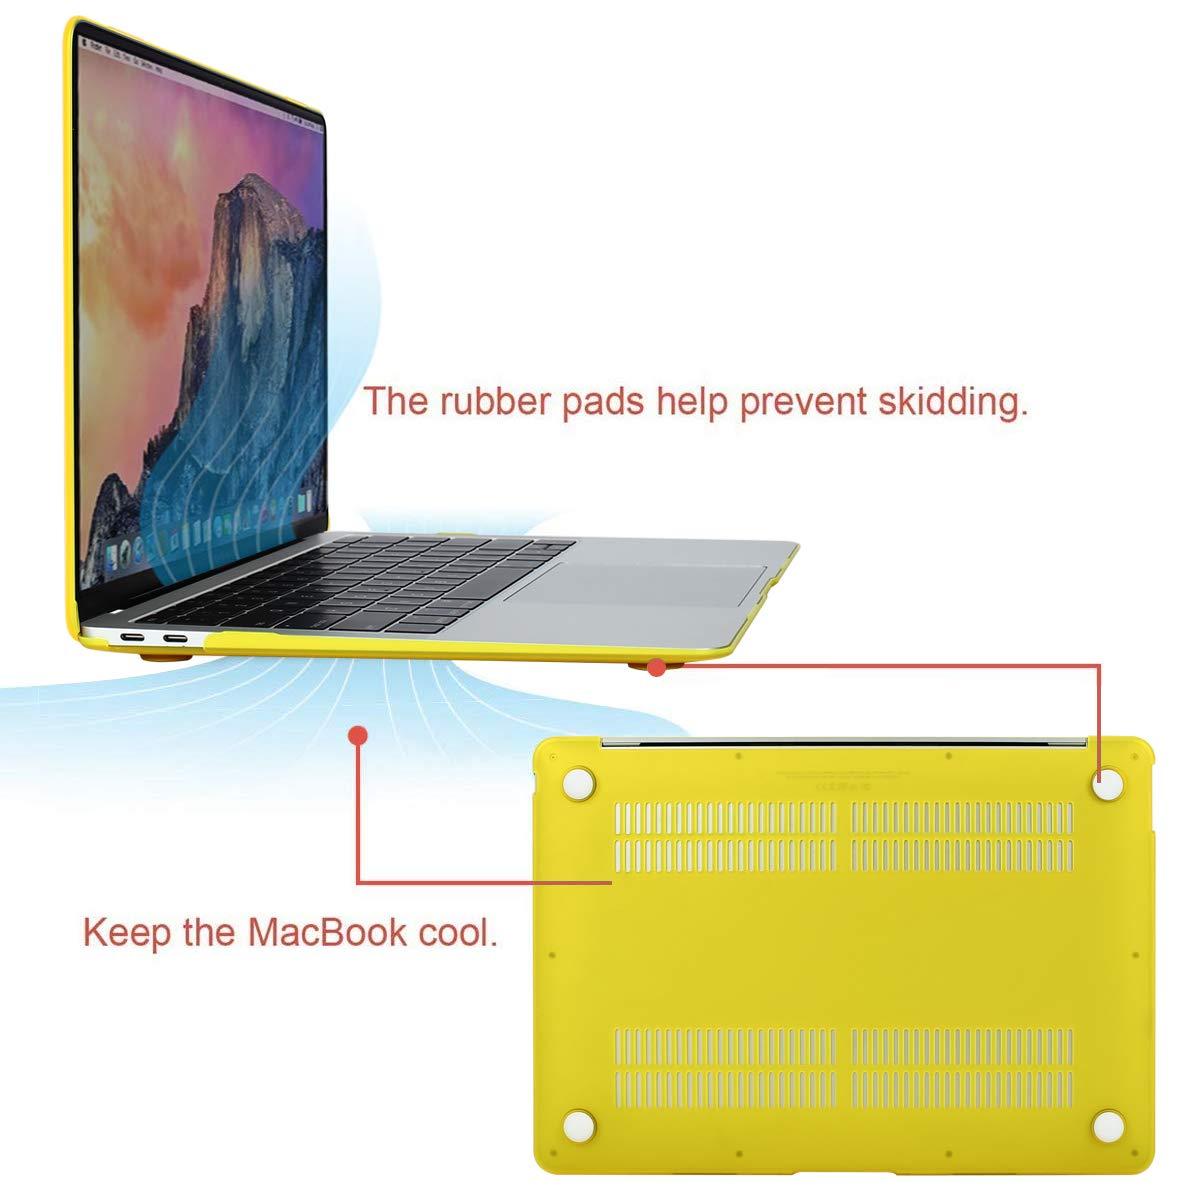 Ultra Delgado Carcasa R/ígida Protector de Patr/ón de Pl/ástico Cubierta Gris Espacial MOSISO Funda Dura Compatible 2019 2018 MacBook Air 13 Pulgadas A1932 con Pantalla Retina /& Touch ID